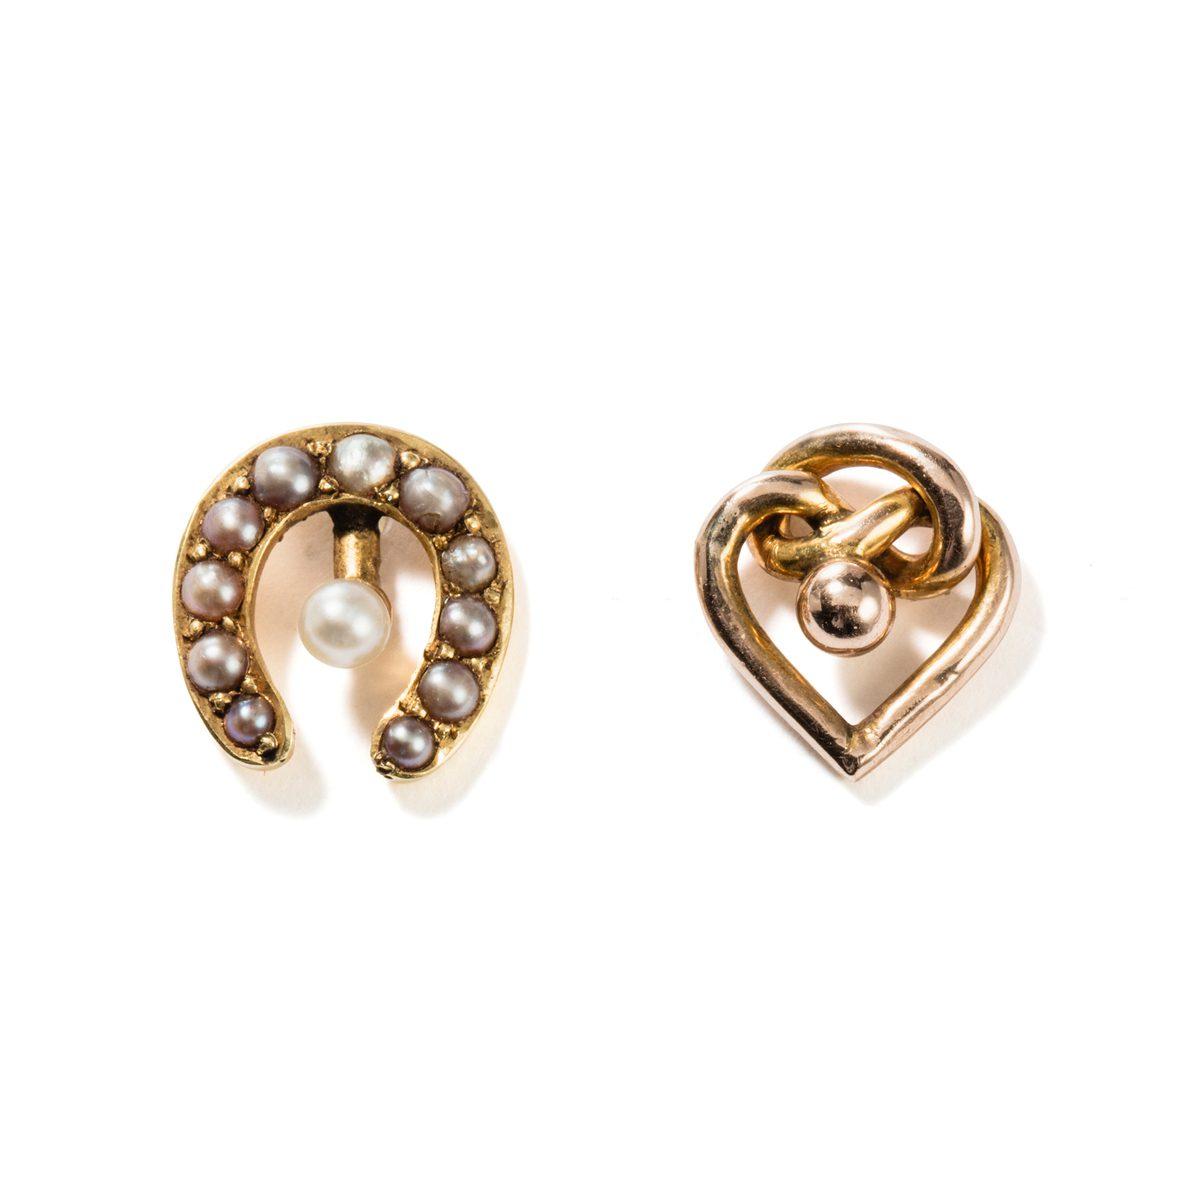 ANNINA VOGEL|Earrings|Halo H.P.FRANCE BIJOUX